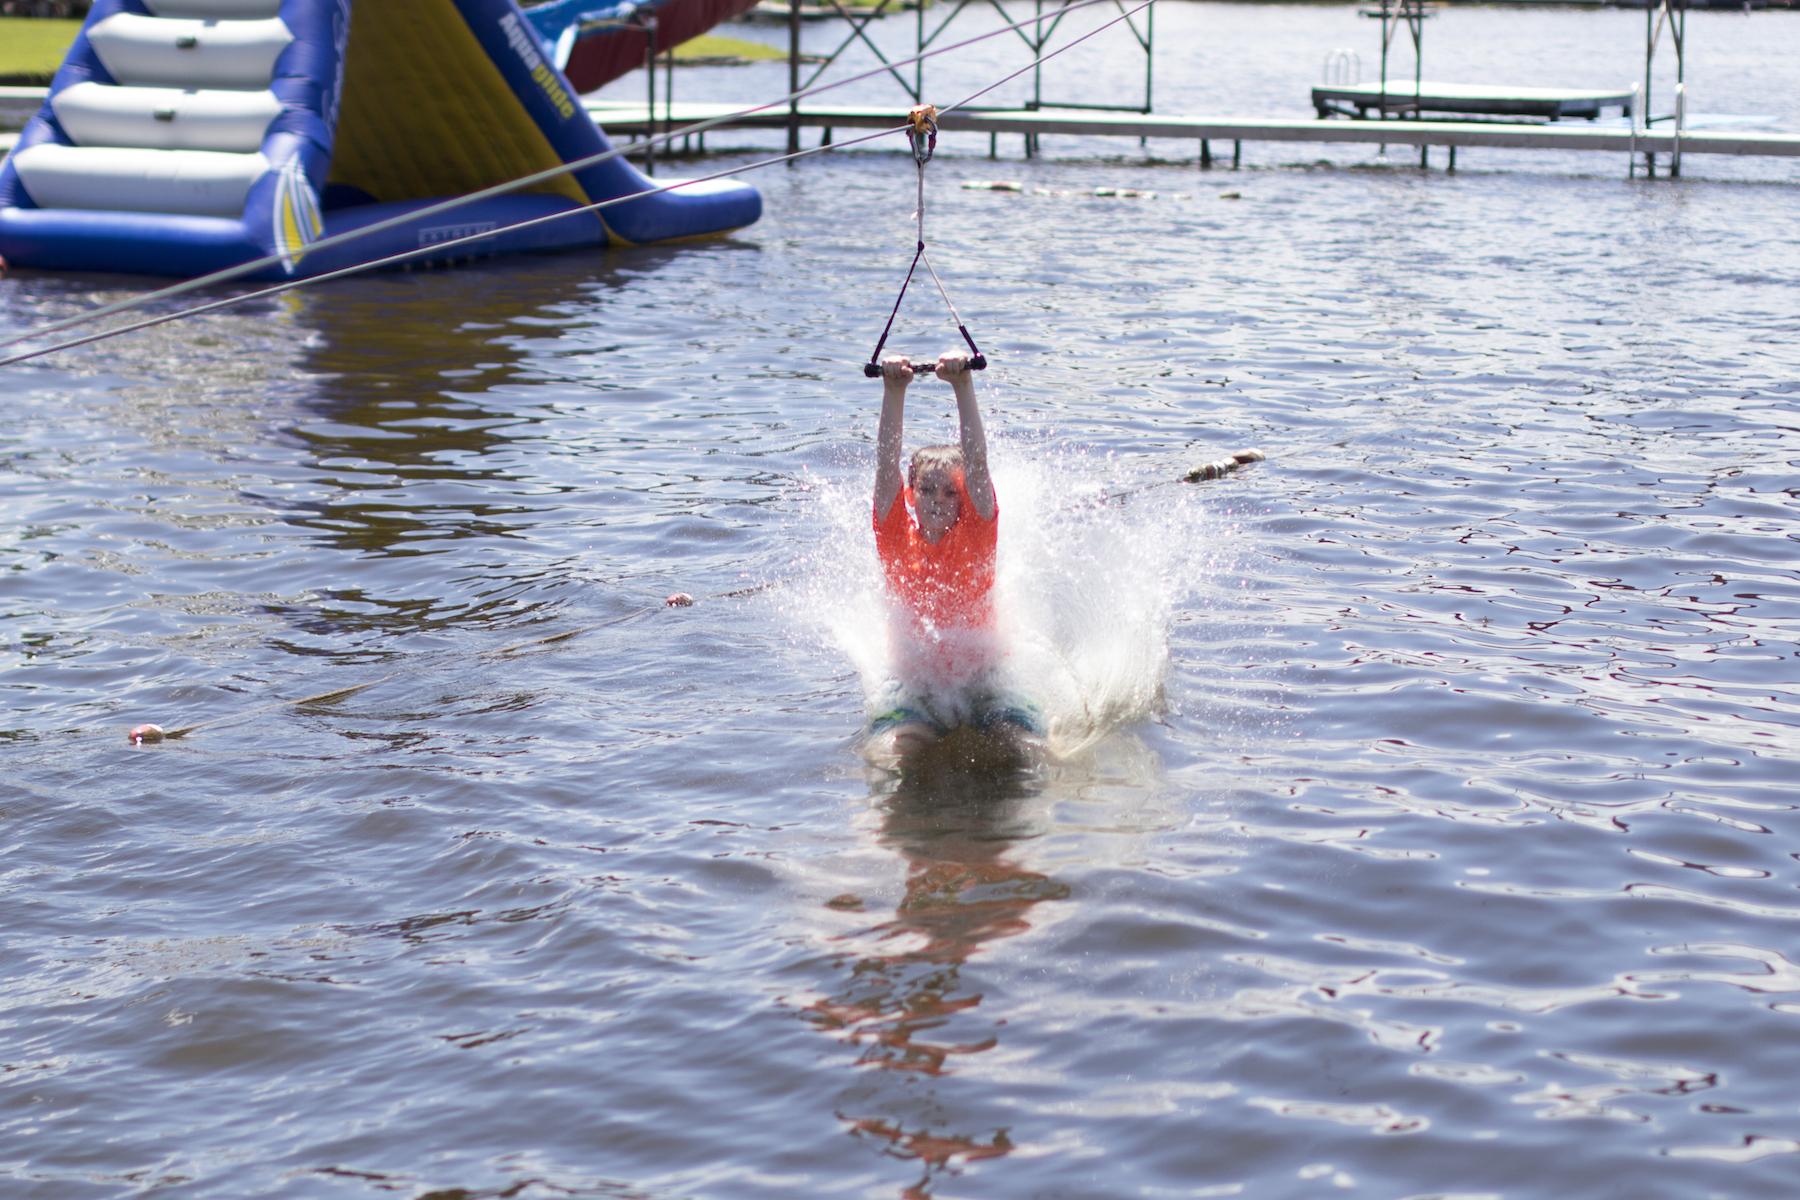 Splash down on the water zipline!